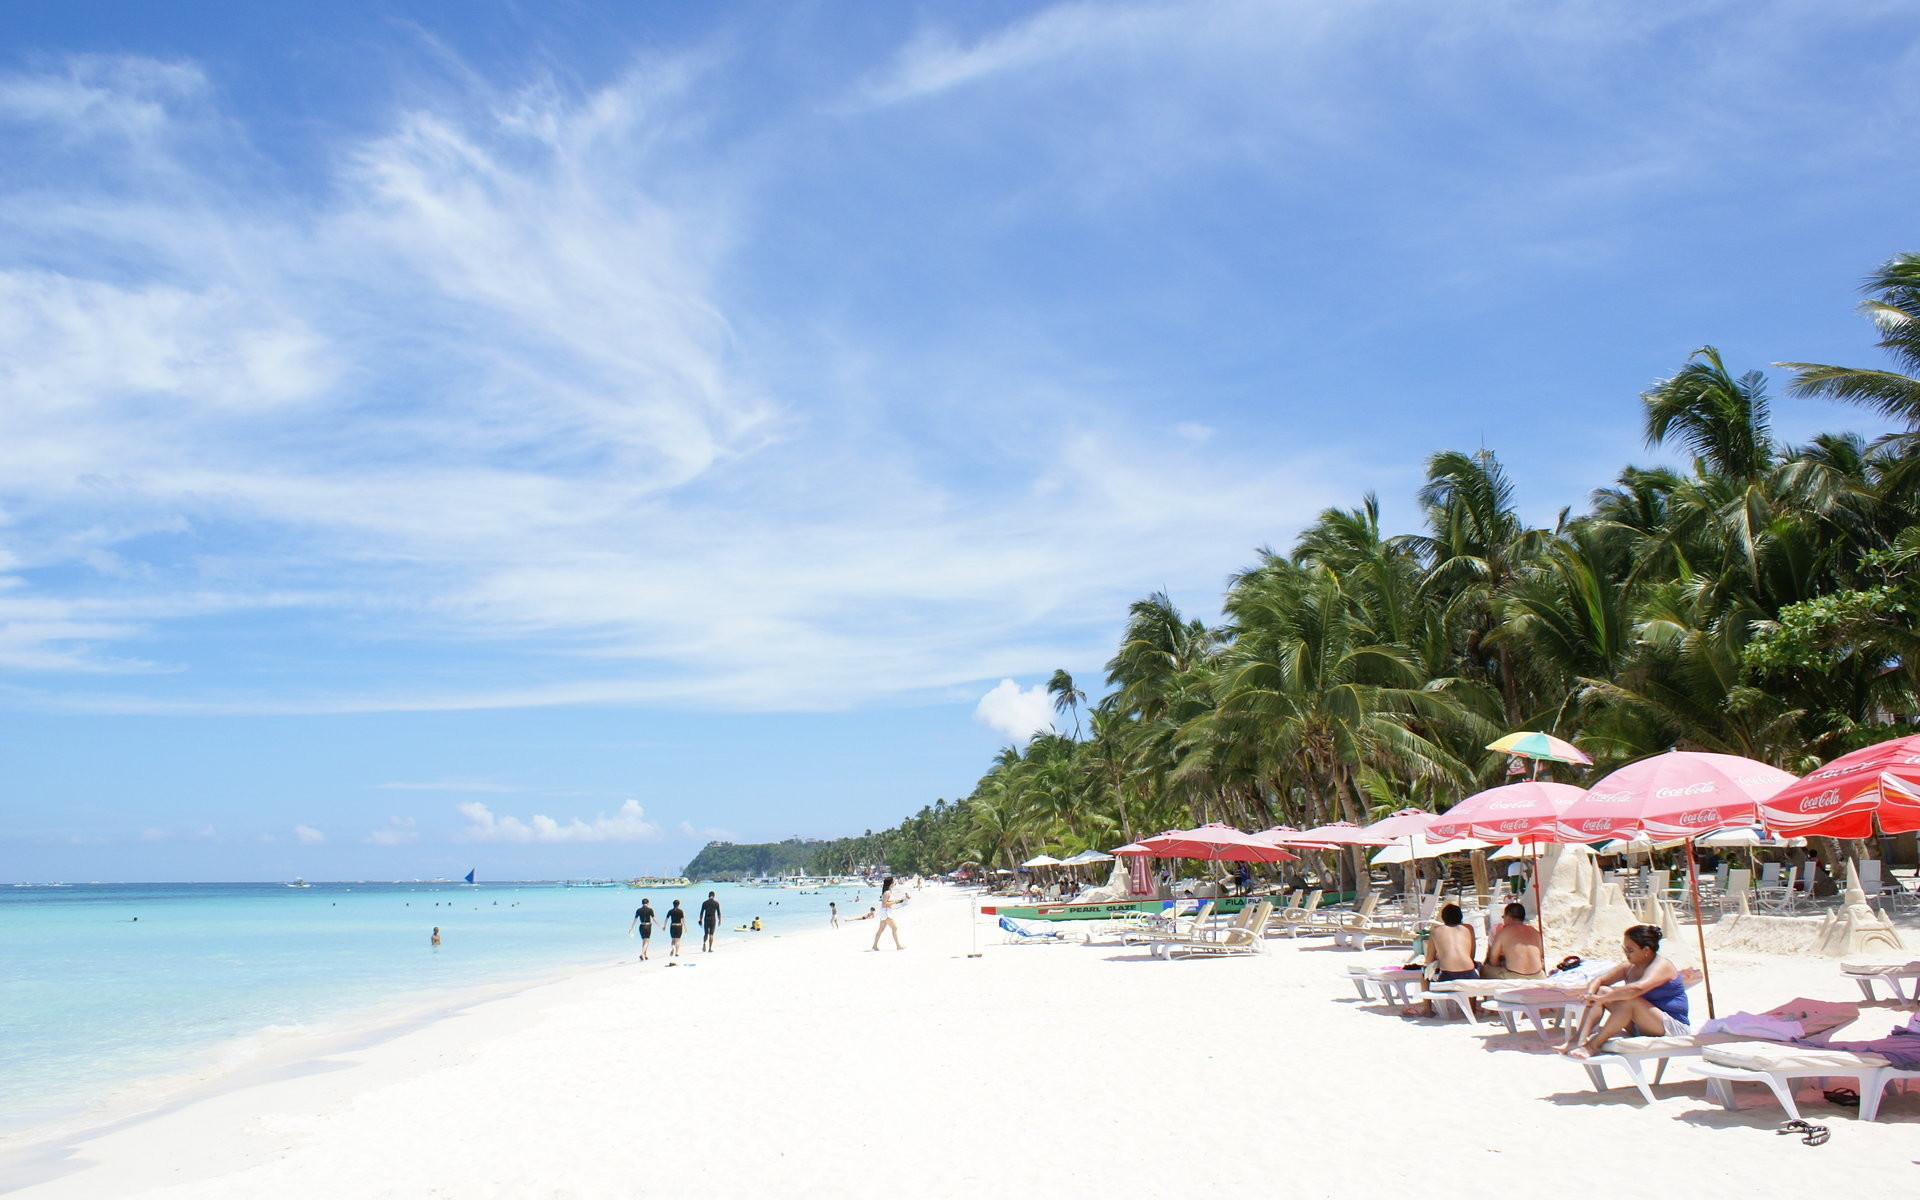 Beach wallpaper – Boracay island